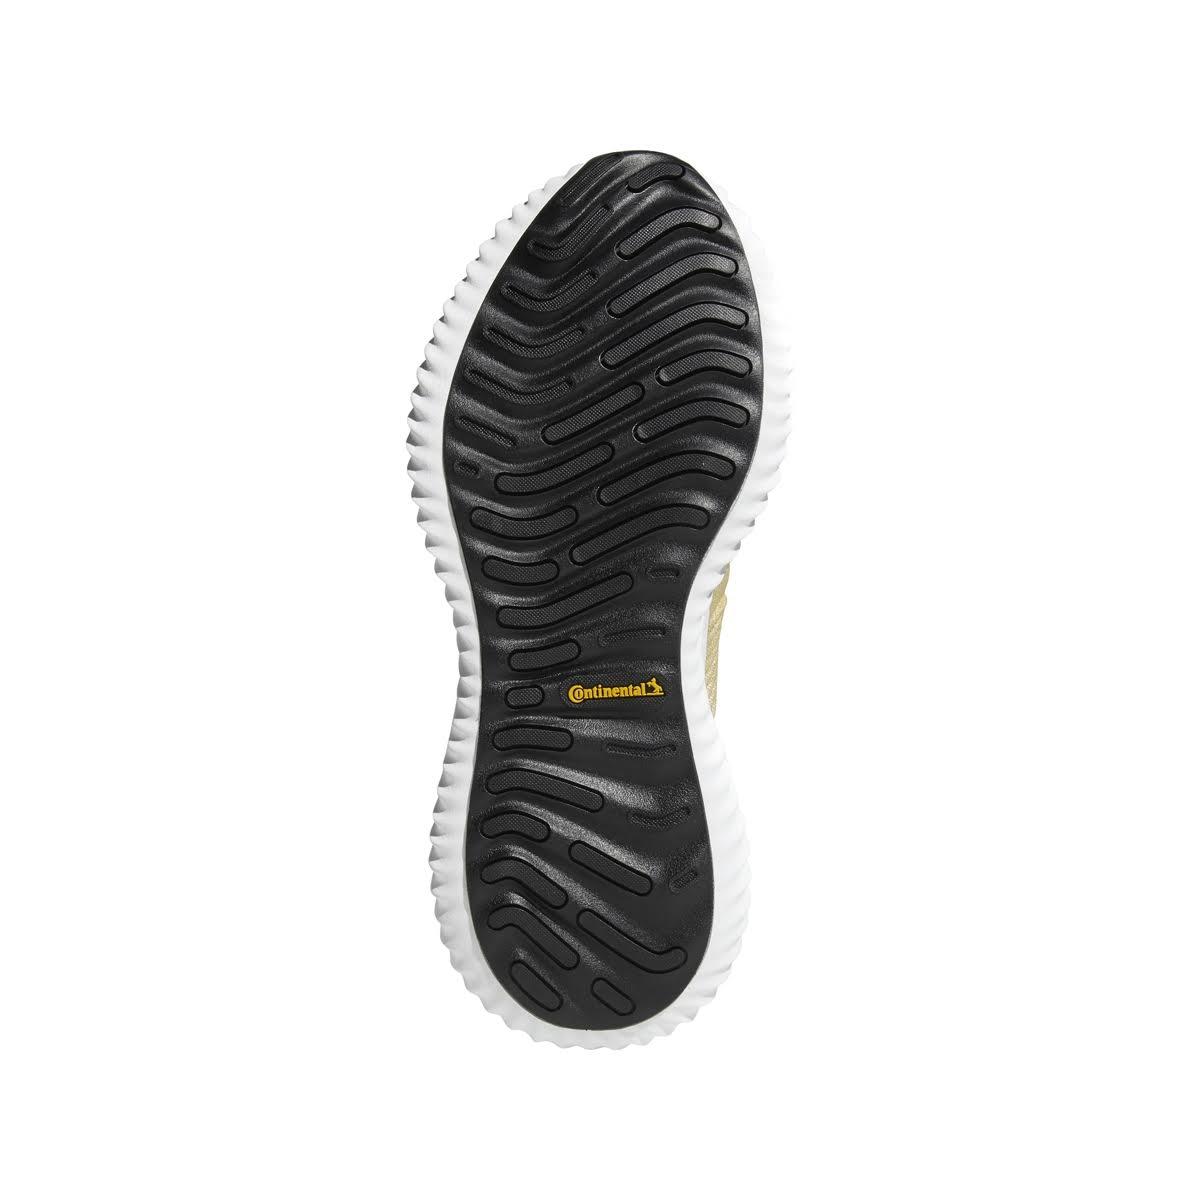 12 Adidas Trainers Team Beyond Unisex Tan Alphabounce qqp40